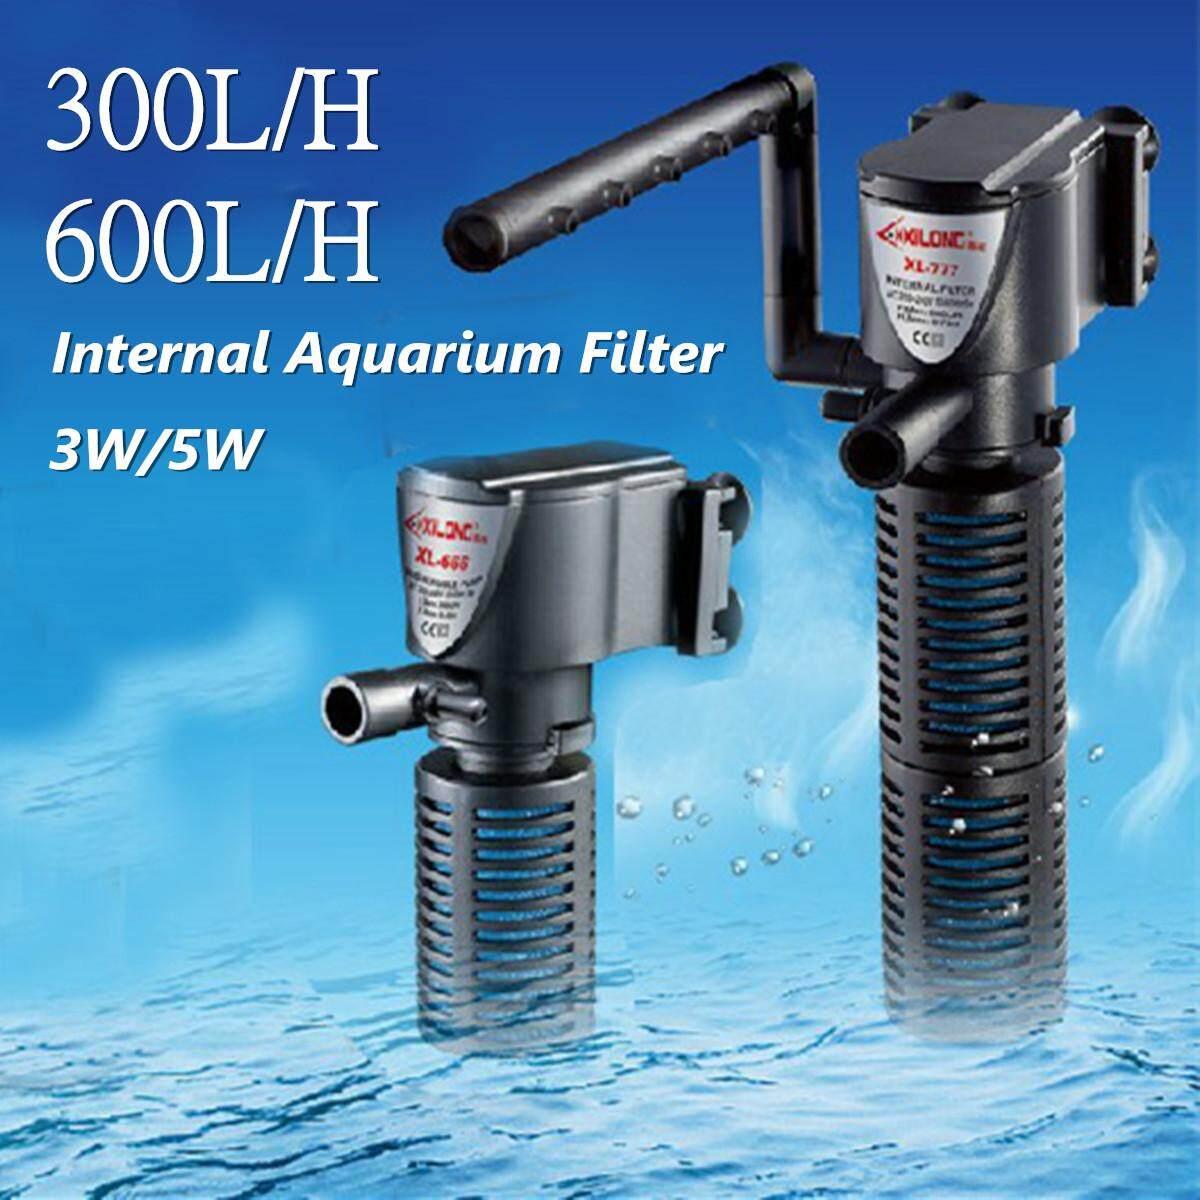 Small Aquarium Internal Filter Fish Tank Oxygen Submersible Pump Spray 3 in 1 mini turtle ultra-silence # 5W With Rain Spray